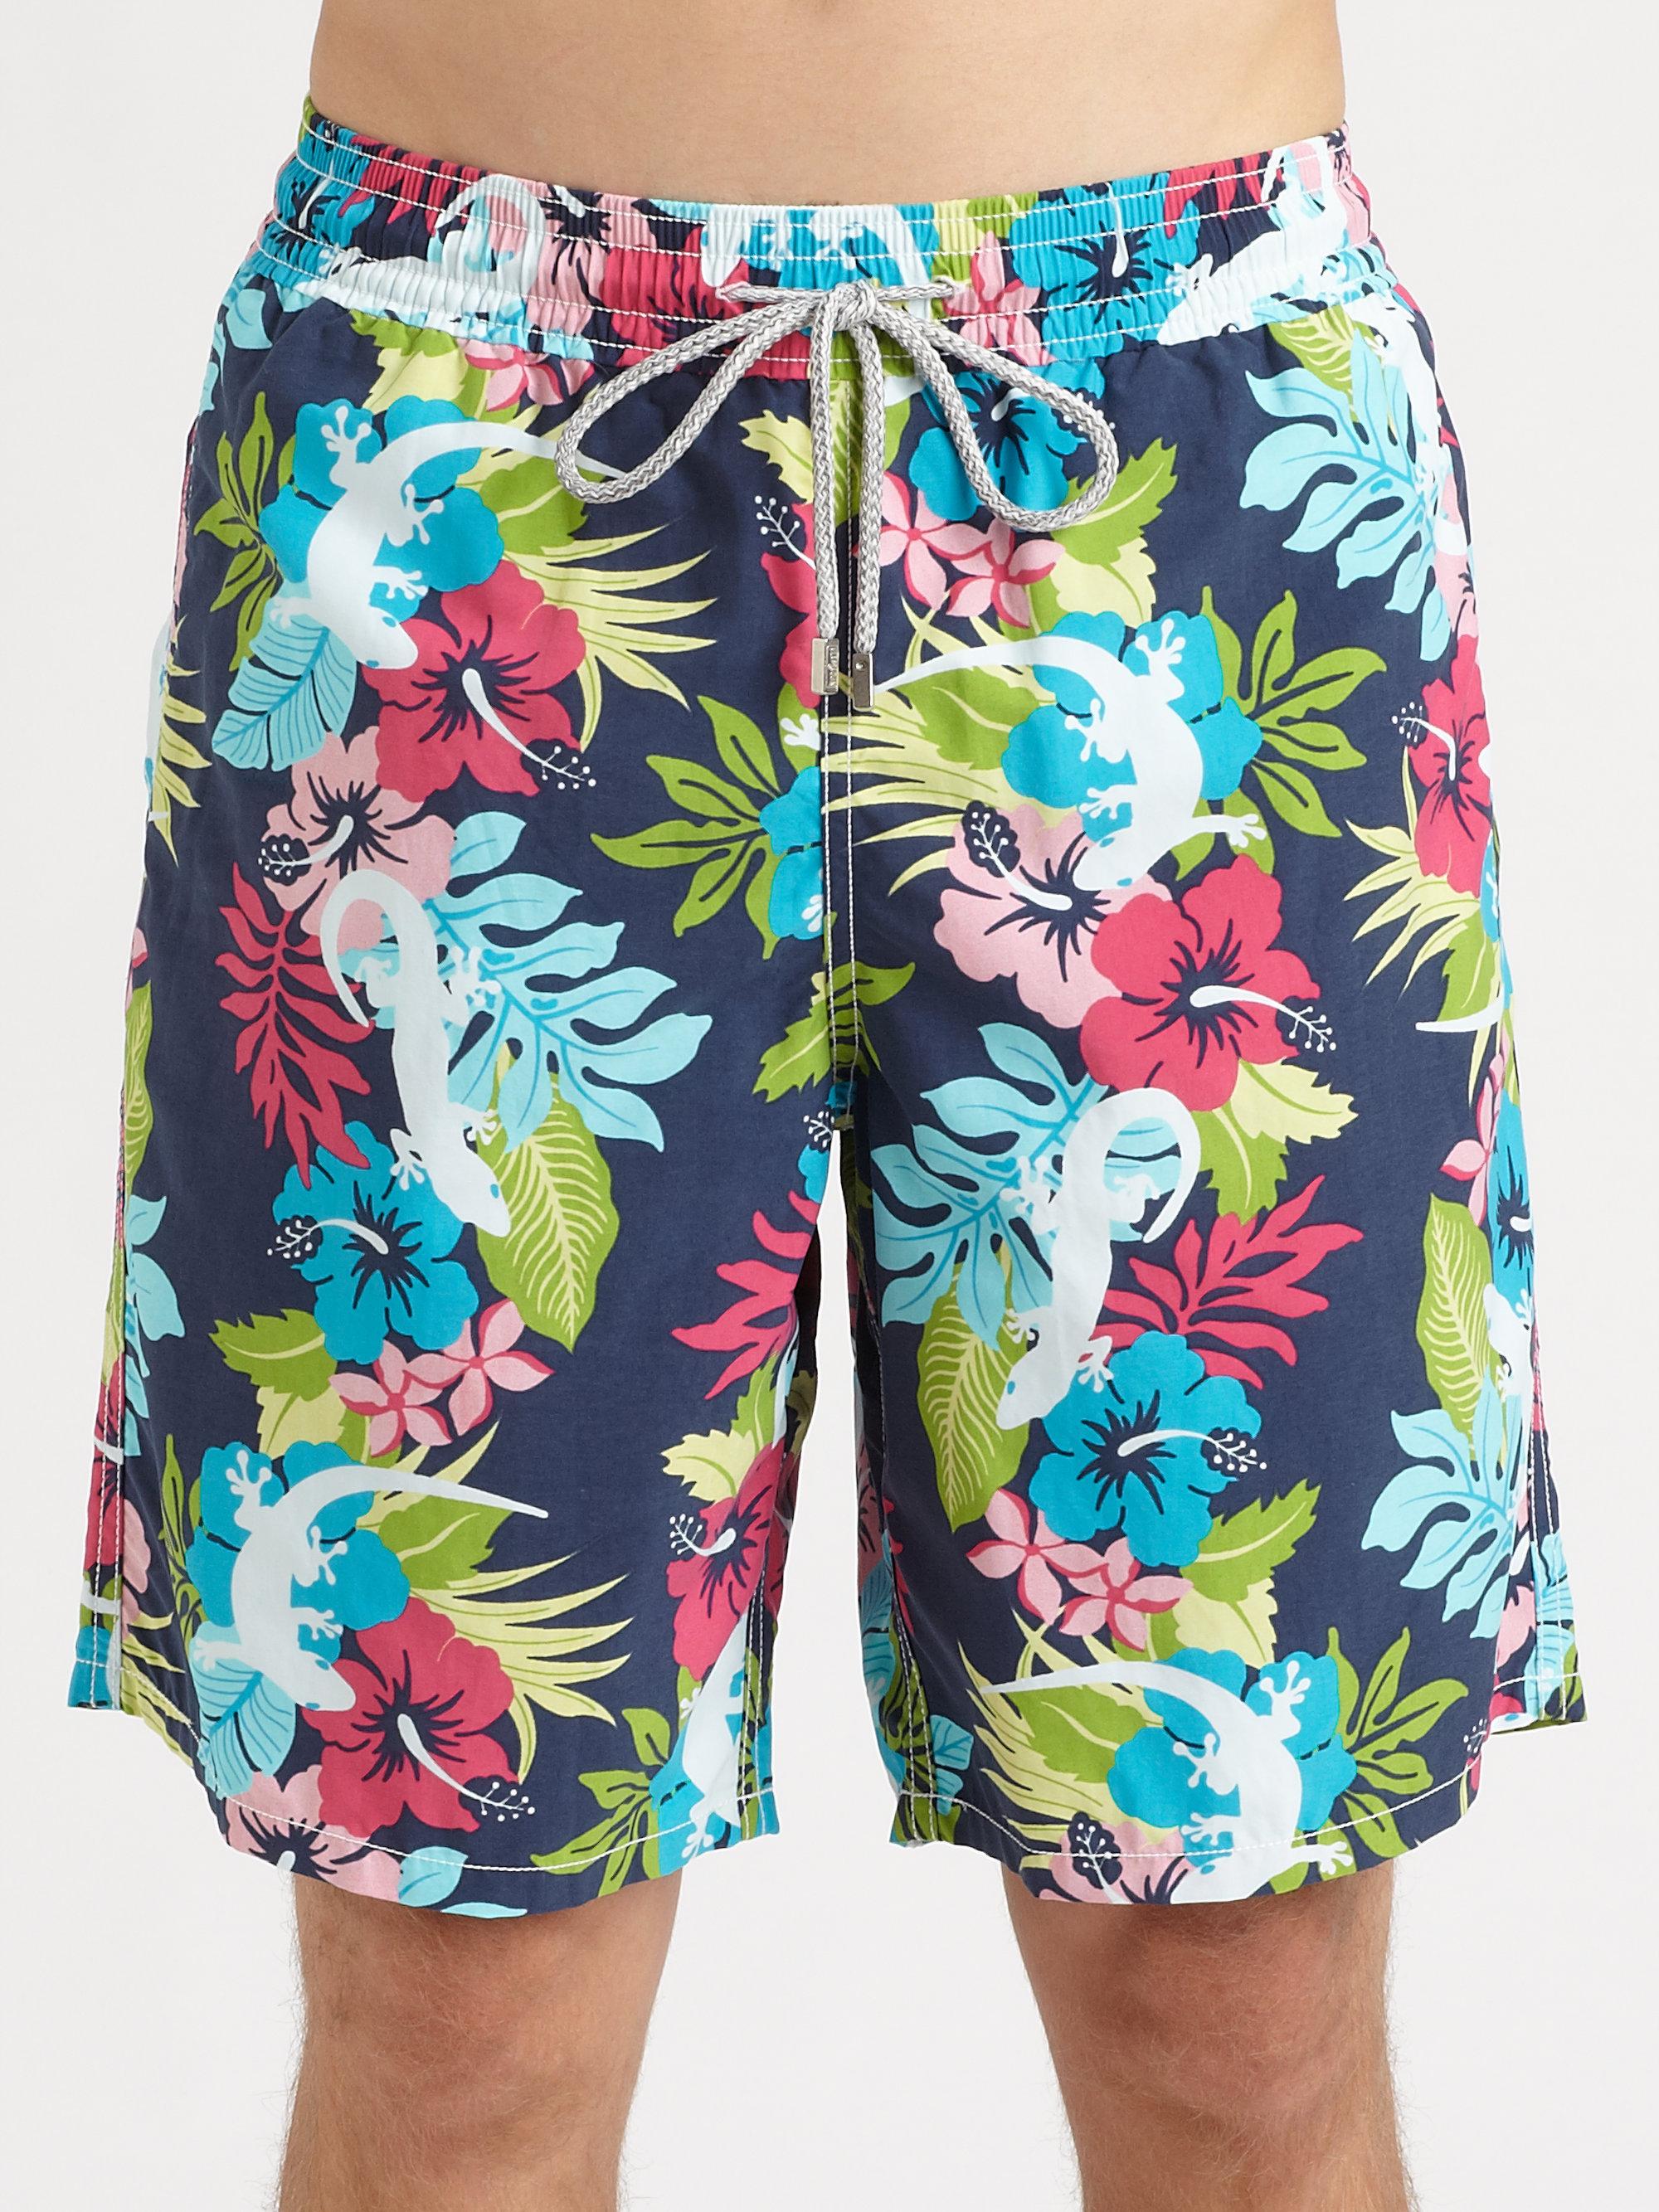 923a9e6c69 Vilebrequin Floral Print Swim Trunks for Men - Lyst